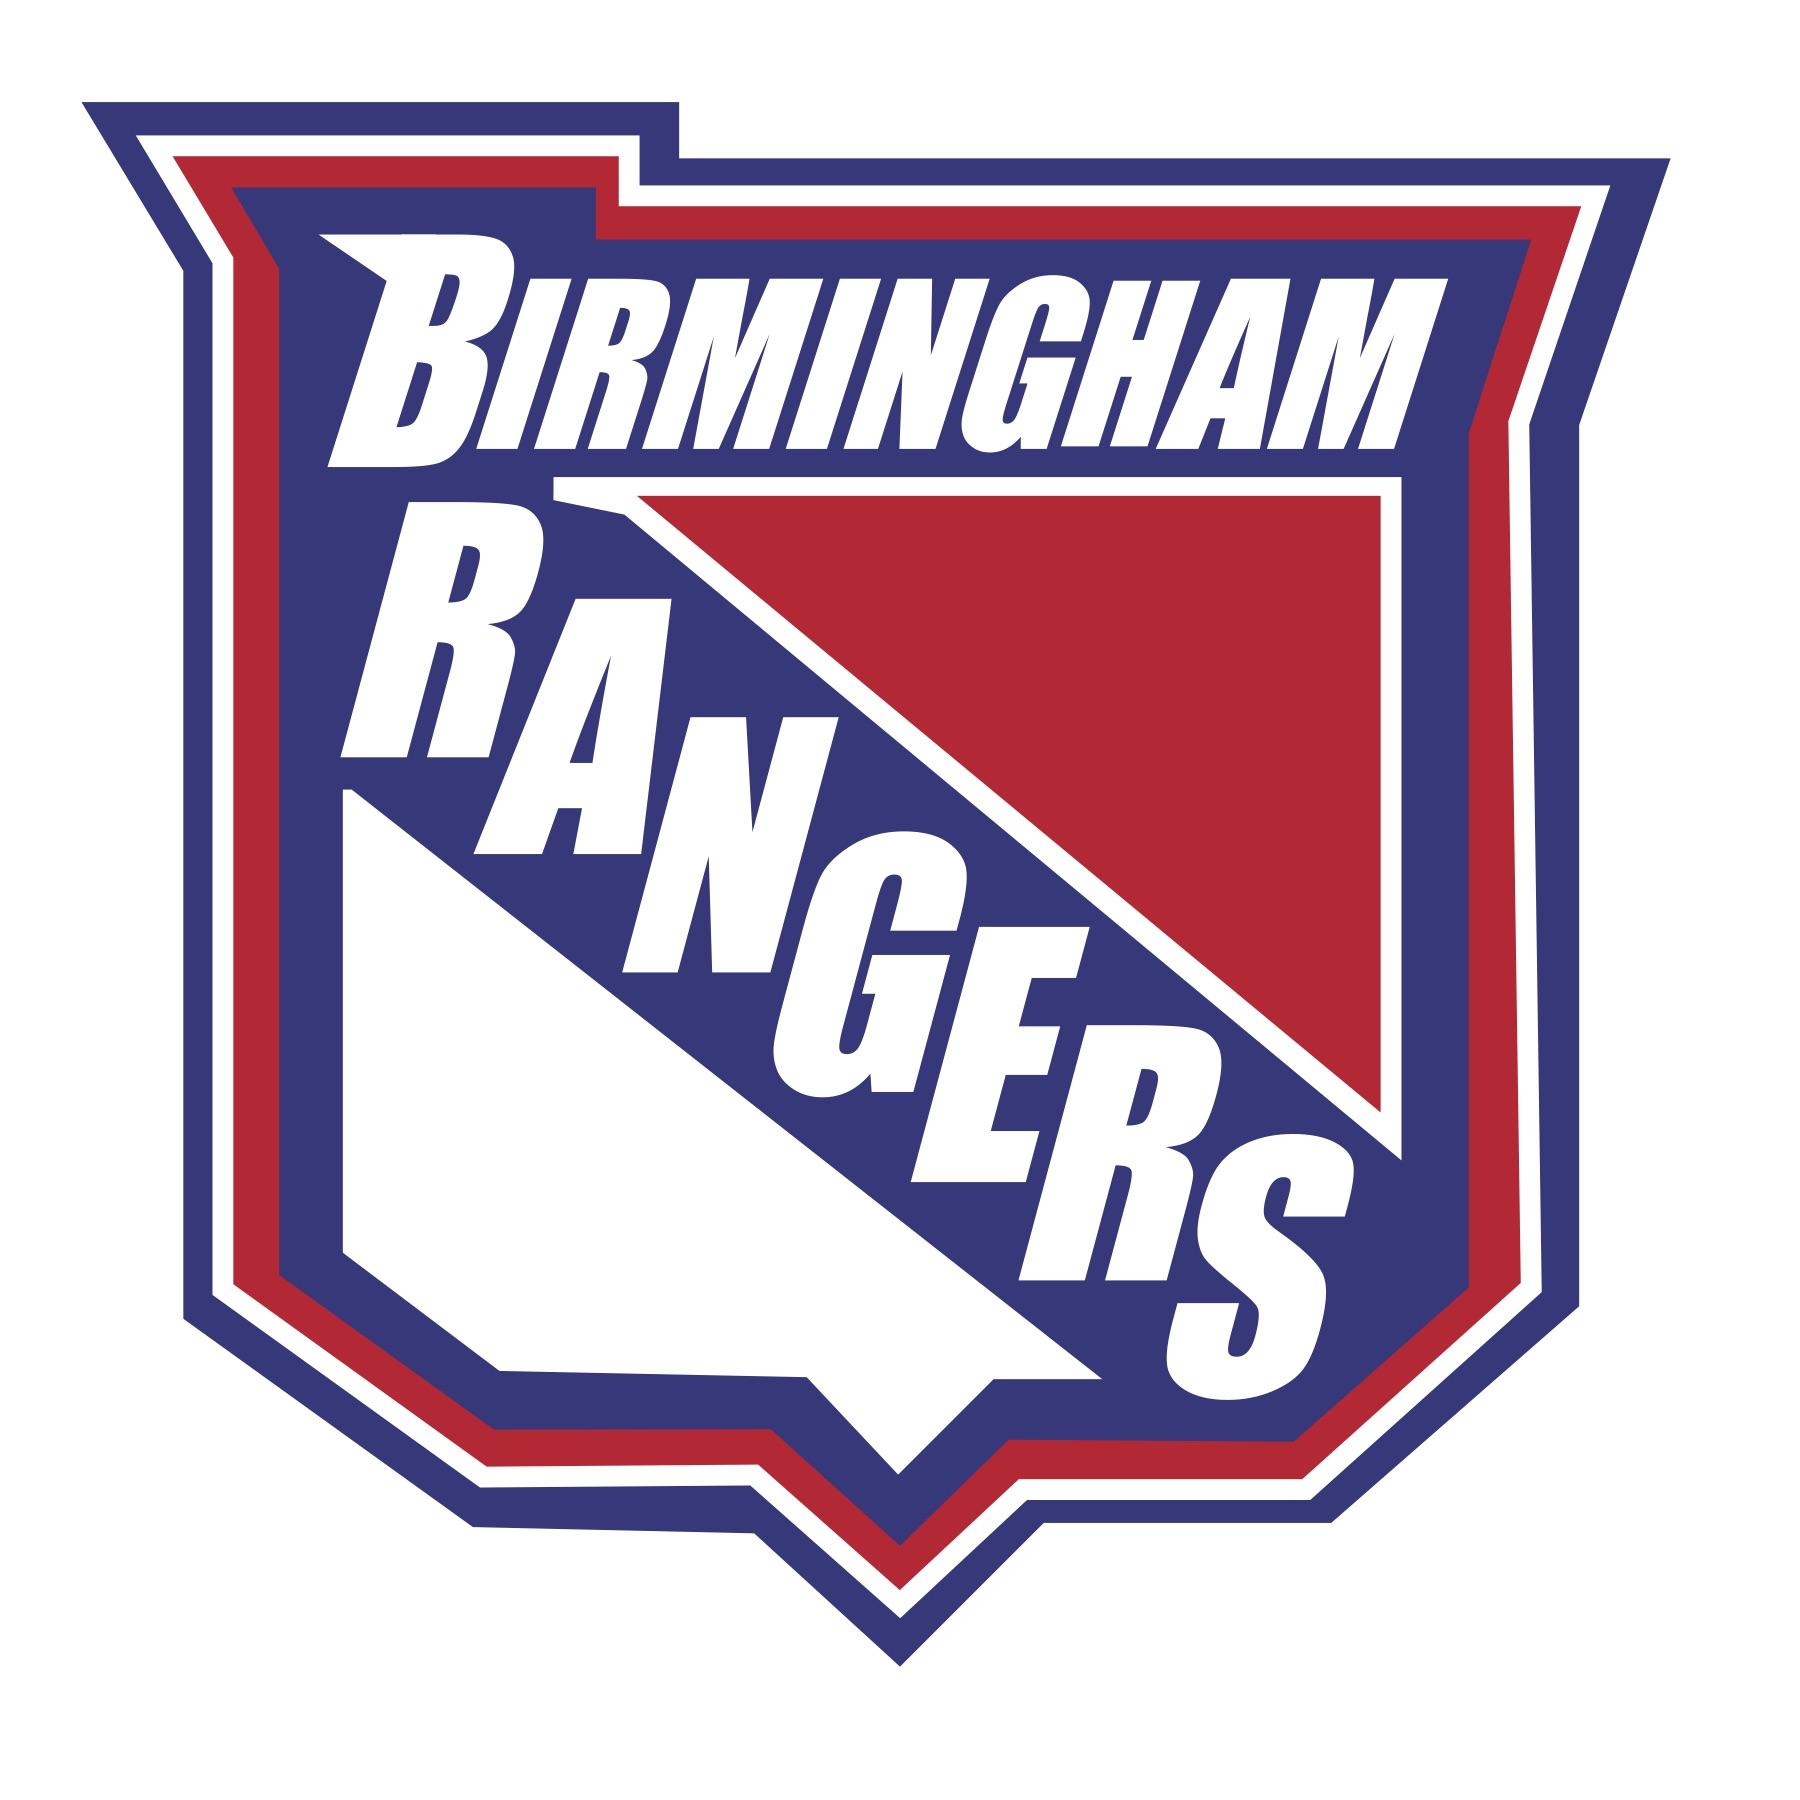 2007 rangers (11u - peewee a)